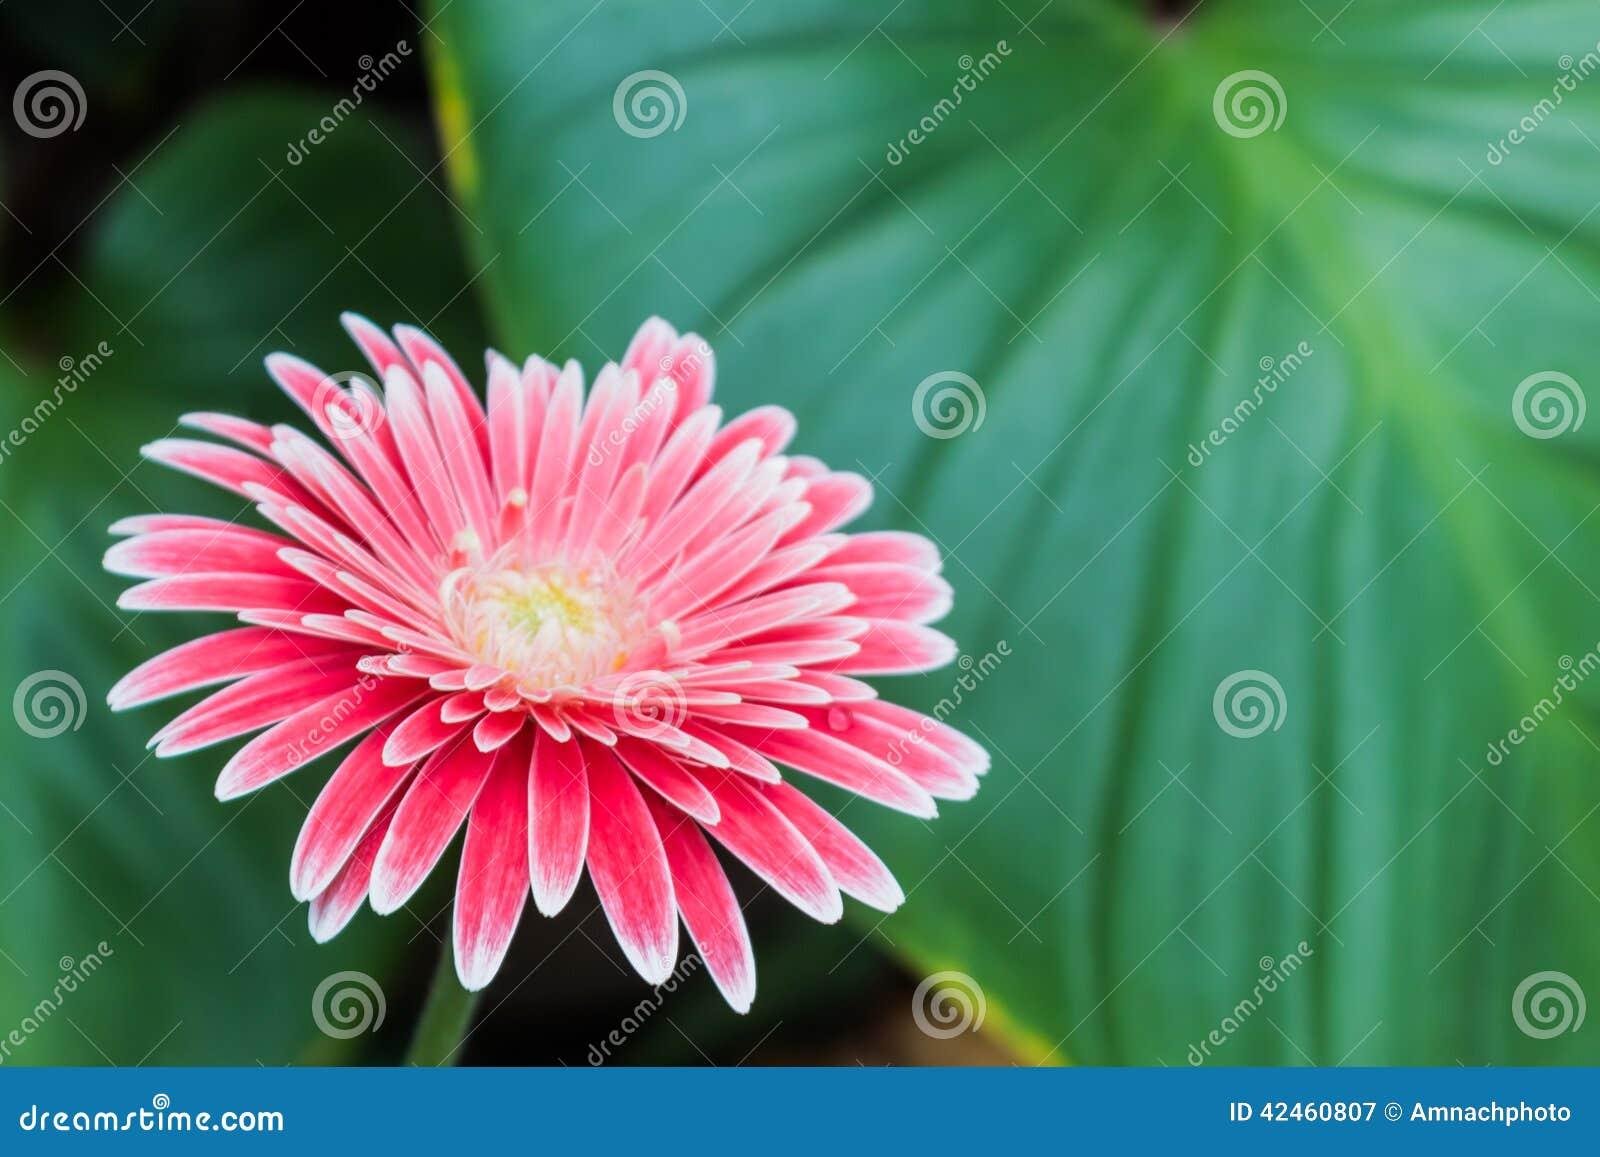 Nahaufnahme einer rosa Gerberagänseblümchenblume